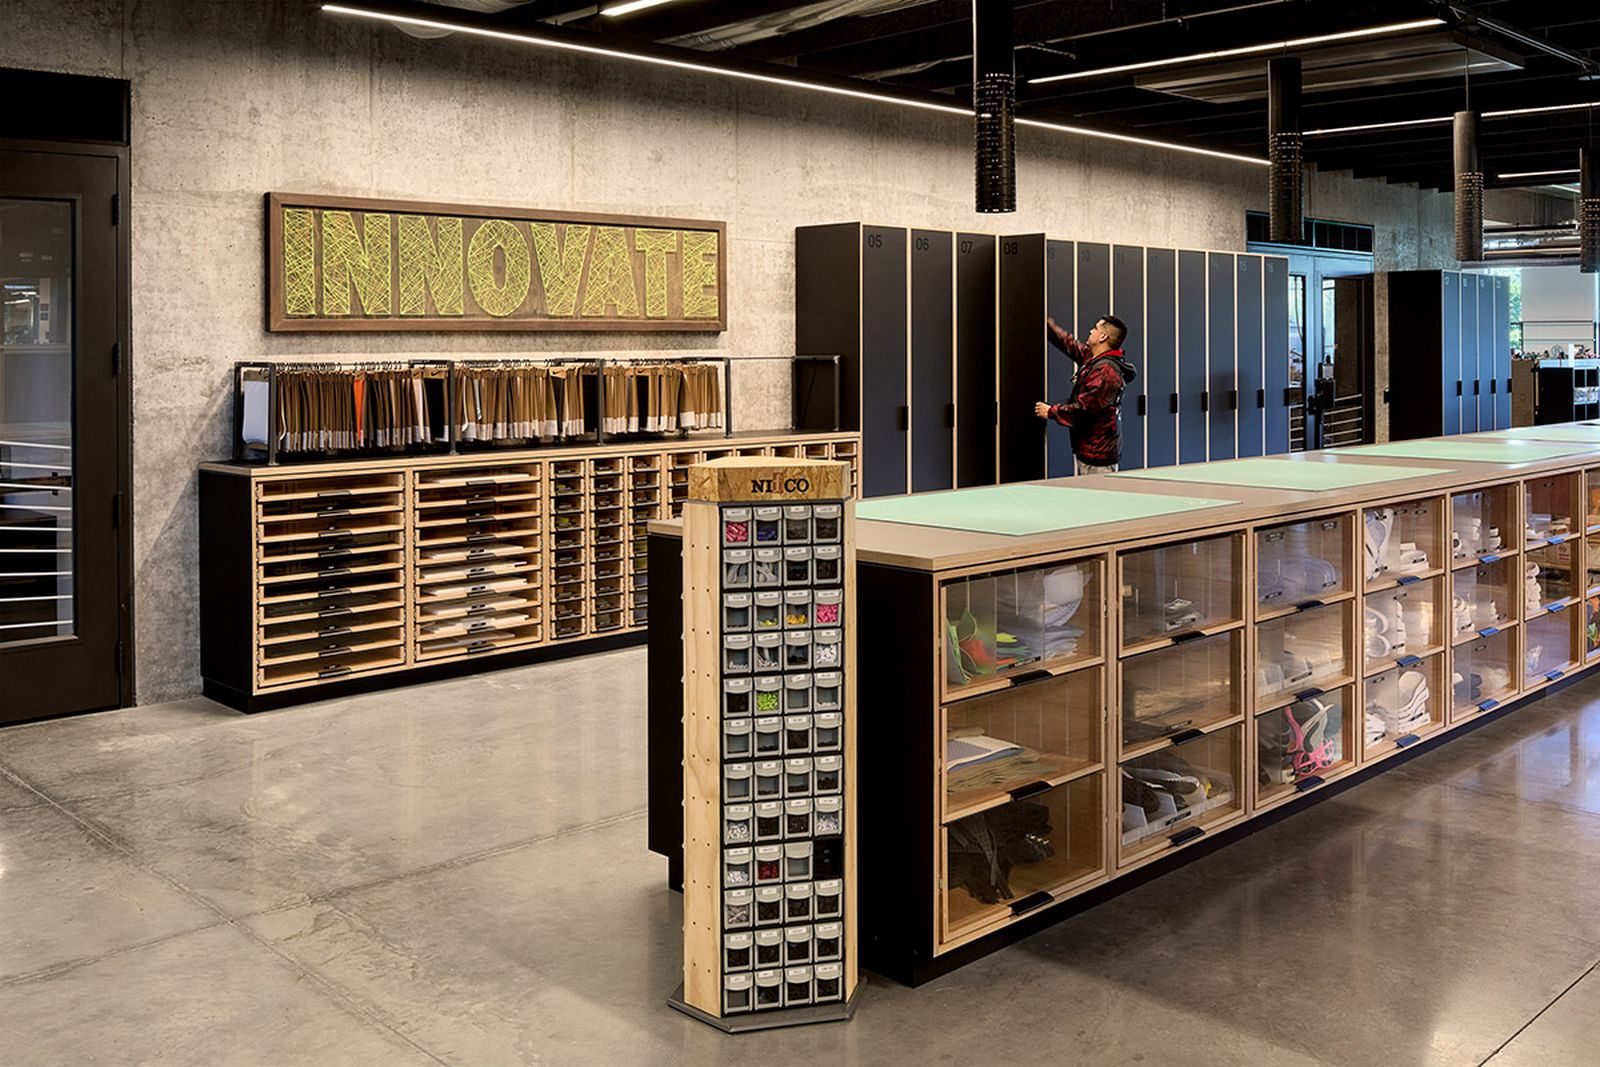 nike-lebron-james-innovation-center- (13)